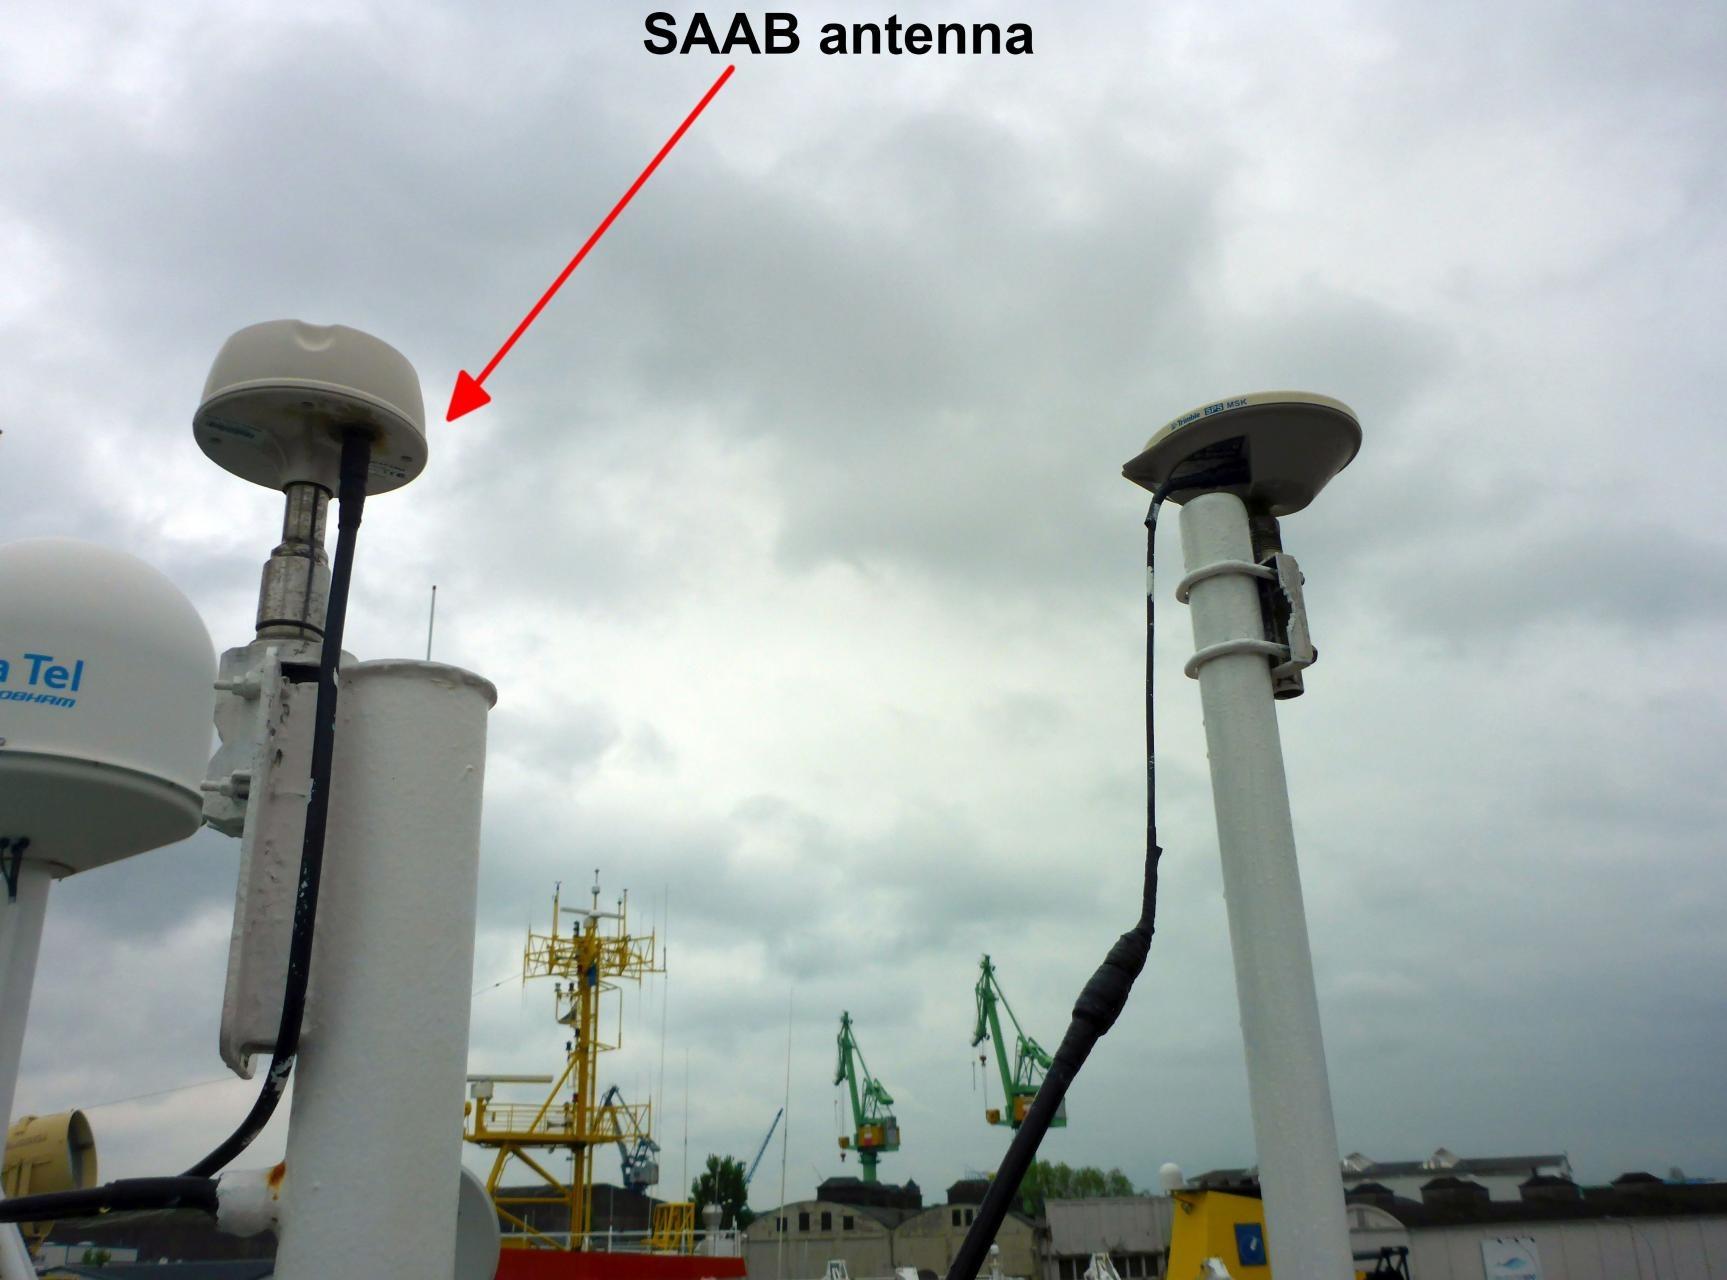 GPS Receiver DGPS SAAB R5 - FS Heincke scientific devices - Confluence